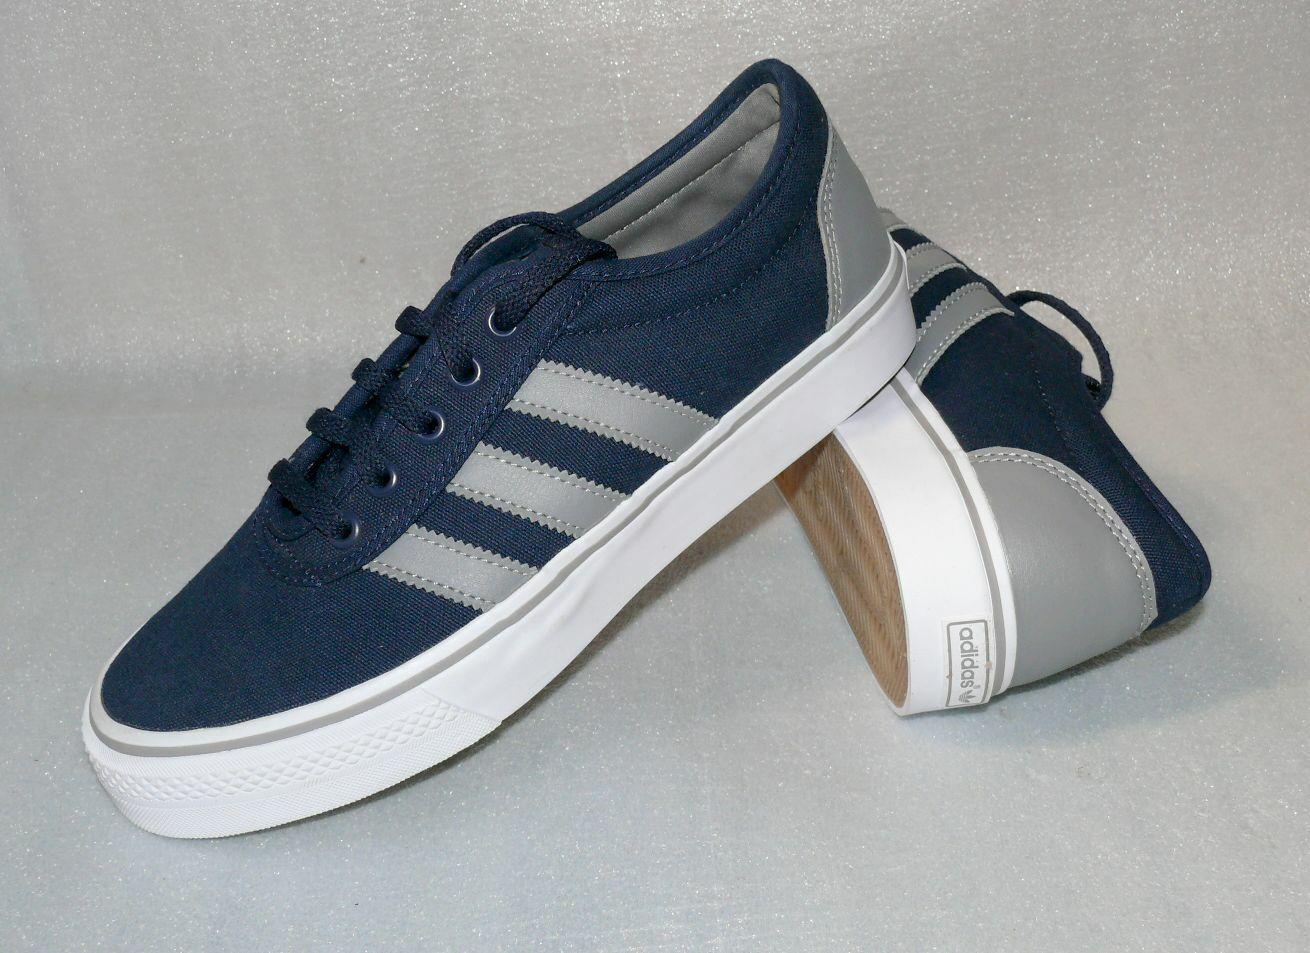 Adidas F37311 ADI EASE Canvas Herren Schuhe Sport Running Turnschuhe 40 - 46 Navy W